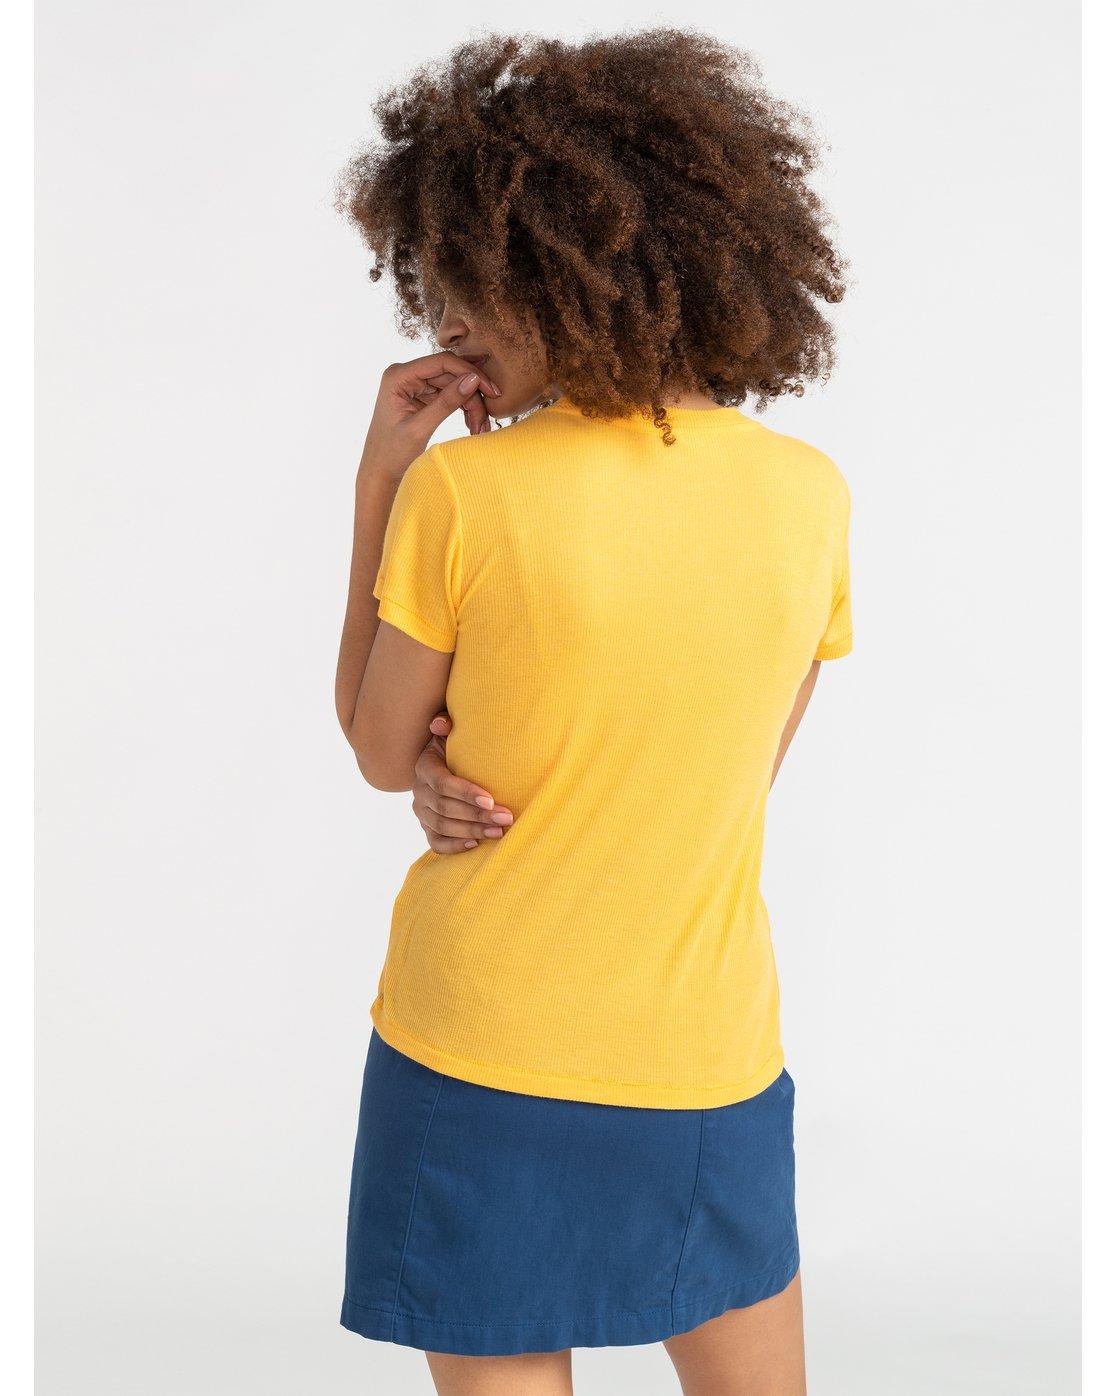 2 Benjamin Jeanjean Alohatiger - T-Shirt for T-Shirt Yellow S3SSRIRVP0 RVCA